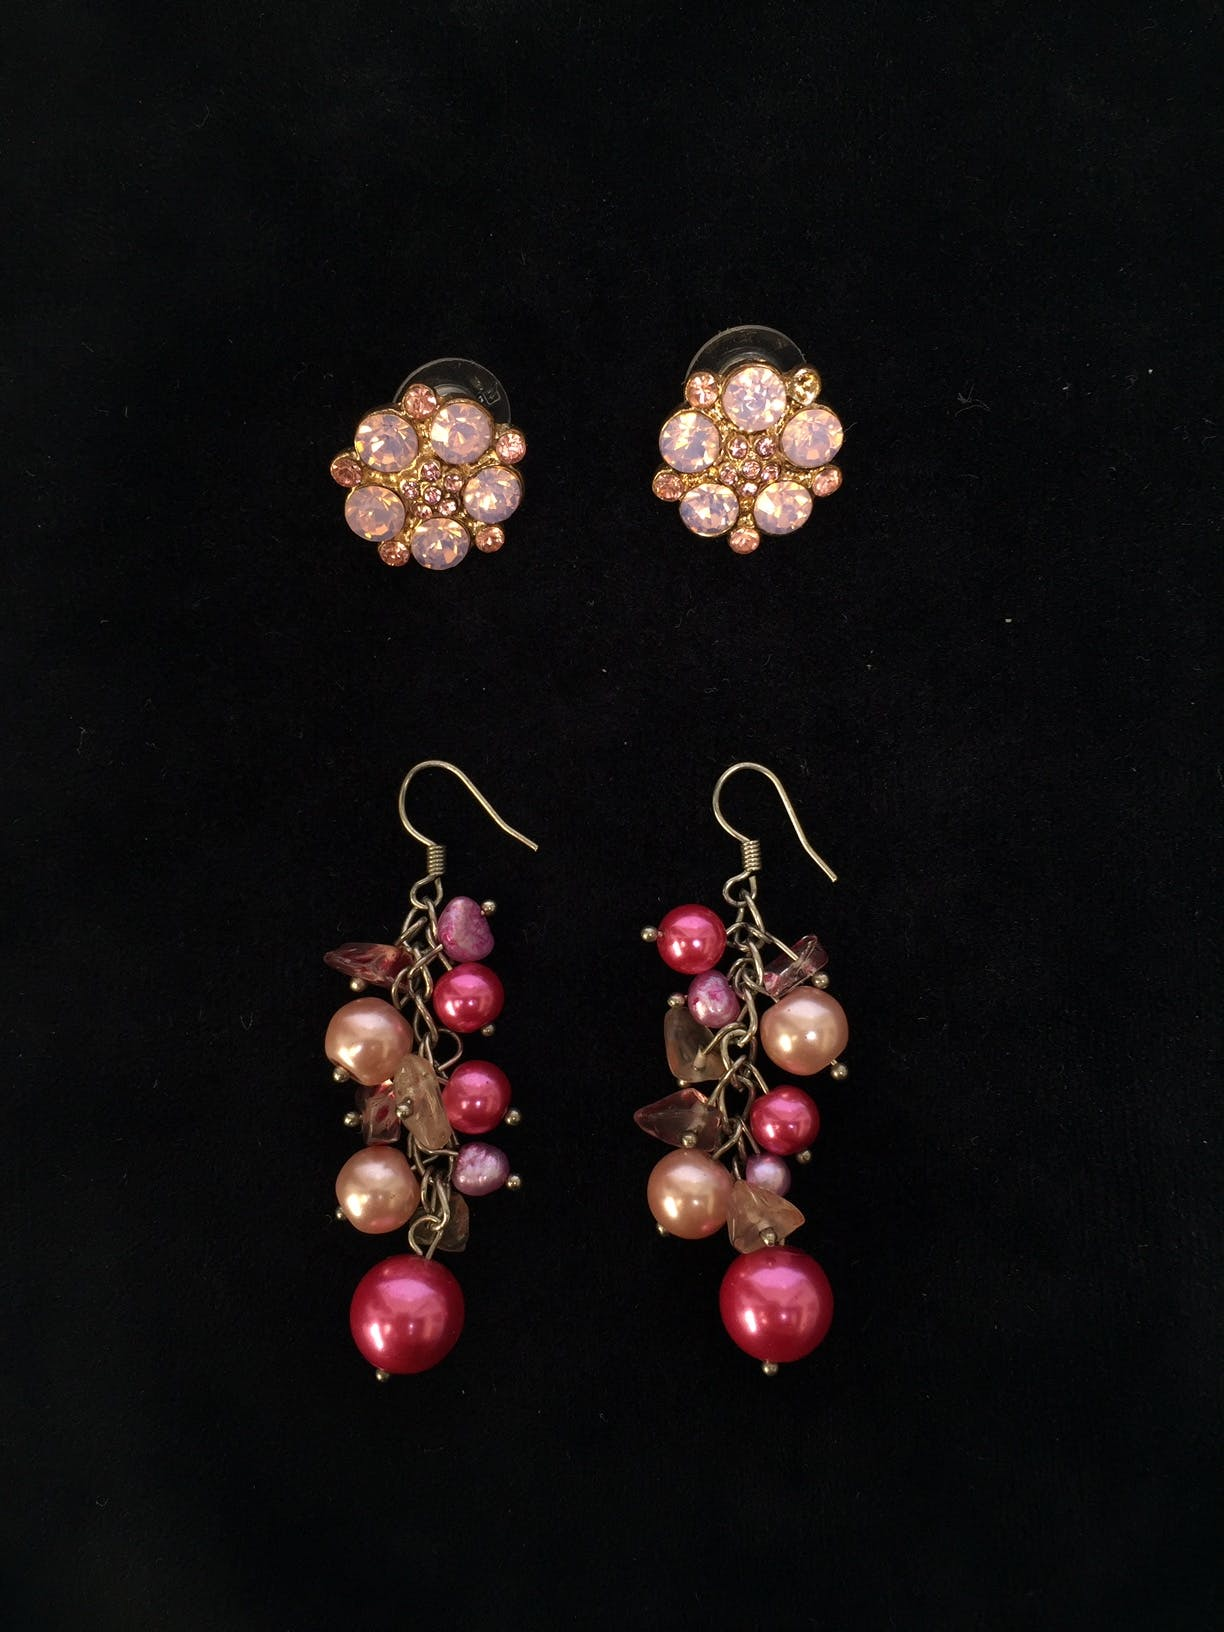 accesorios bijouterie aretes-null-imagen